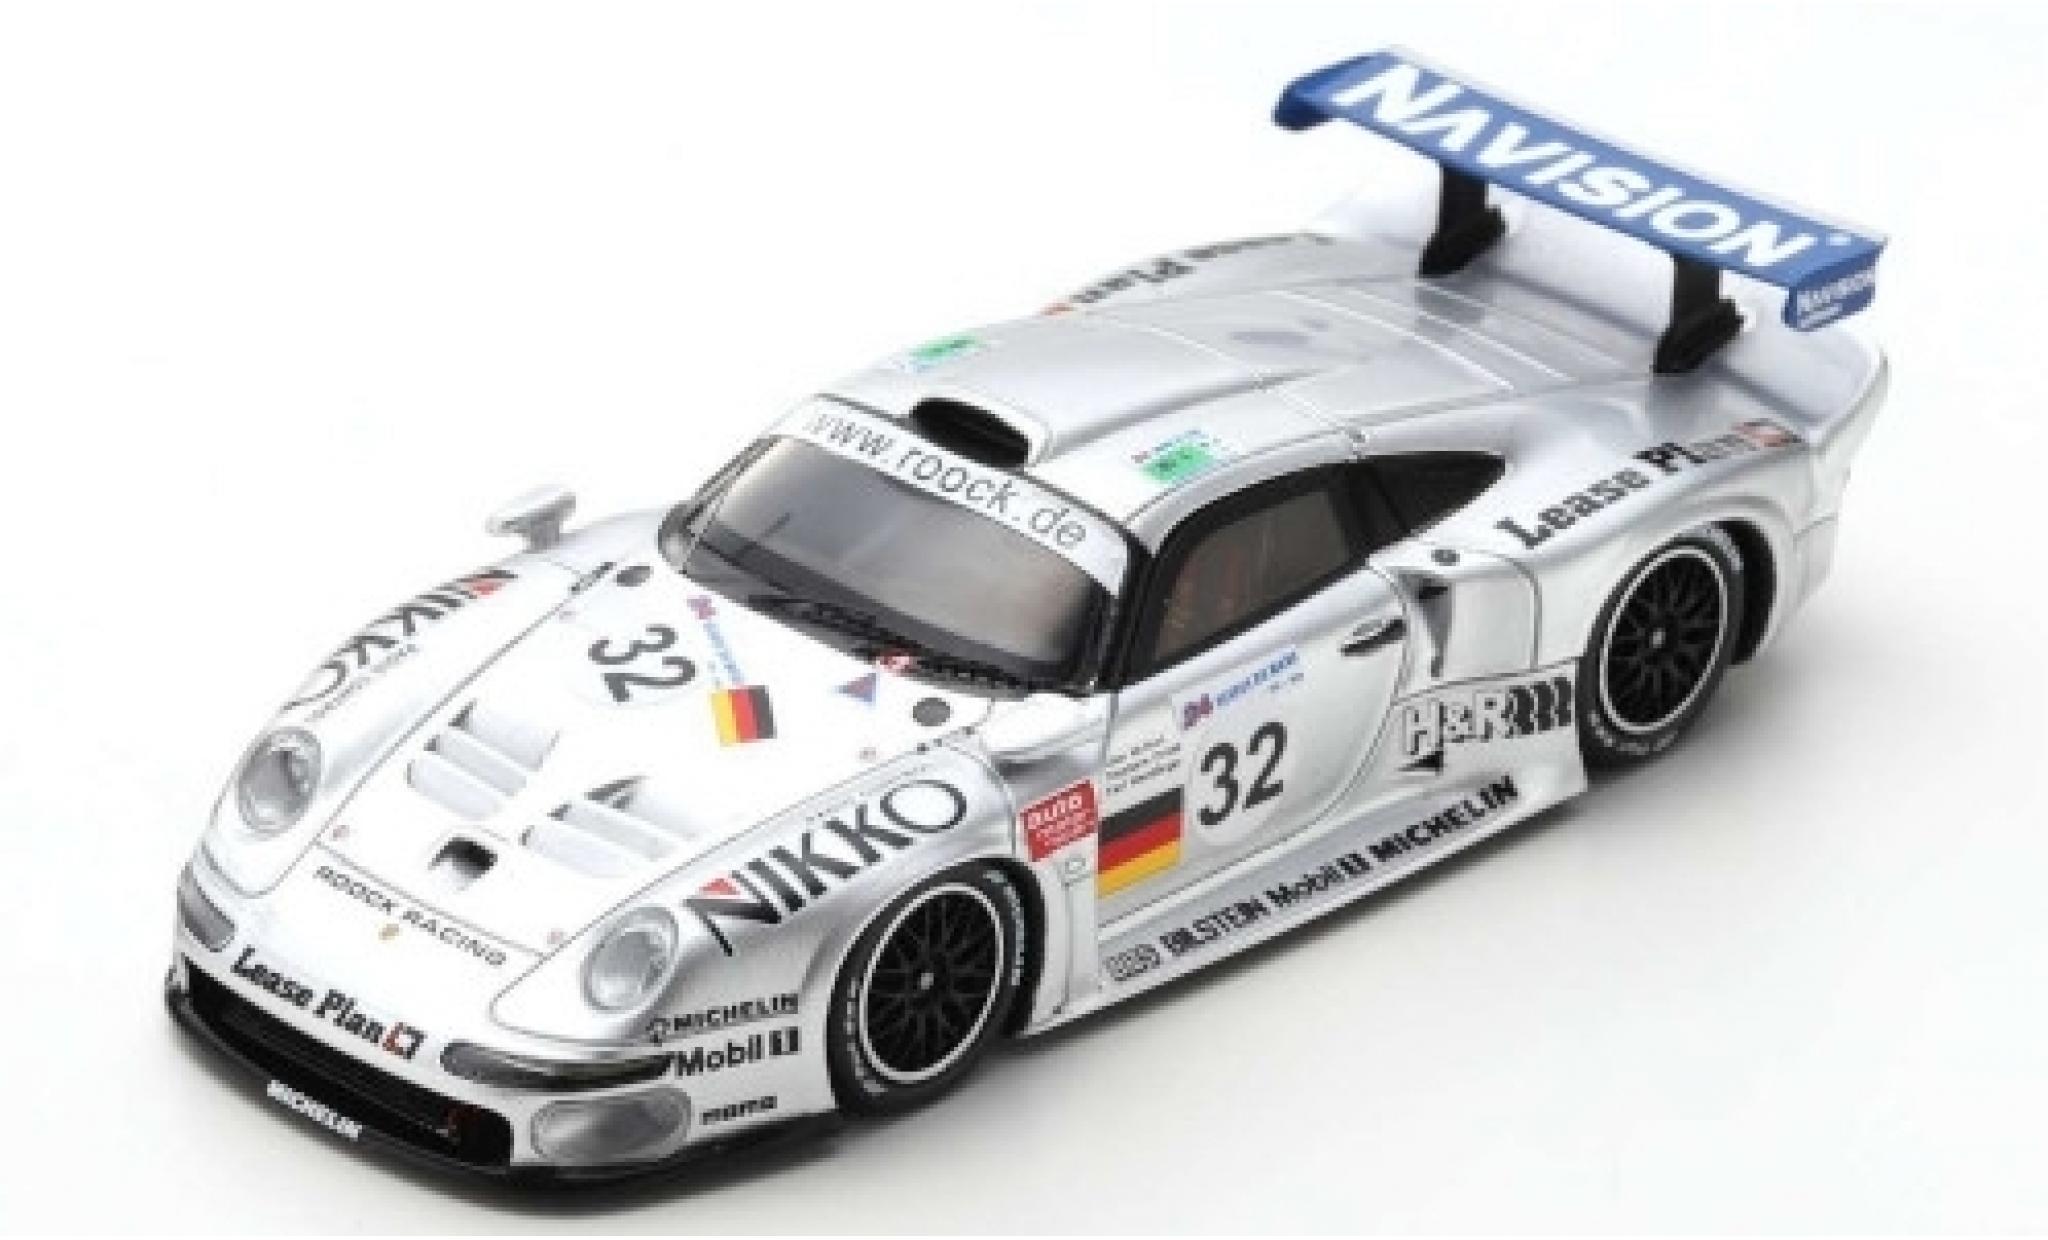 Porsche 996 GT1 1/43 Spark 911 No.32 Roock Racing 24h Le Mans 1997 A.McNish/S.Ortelli/K.Wendlinger